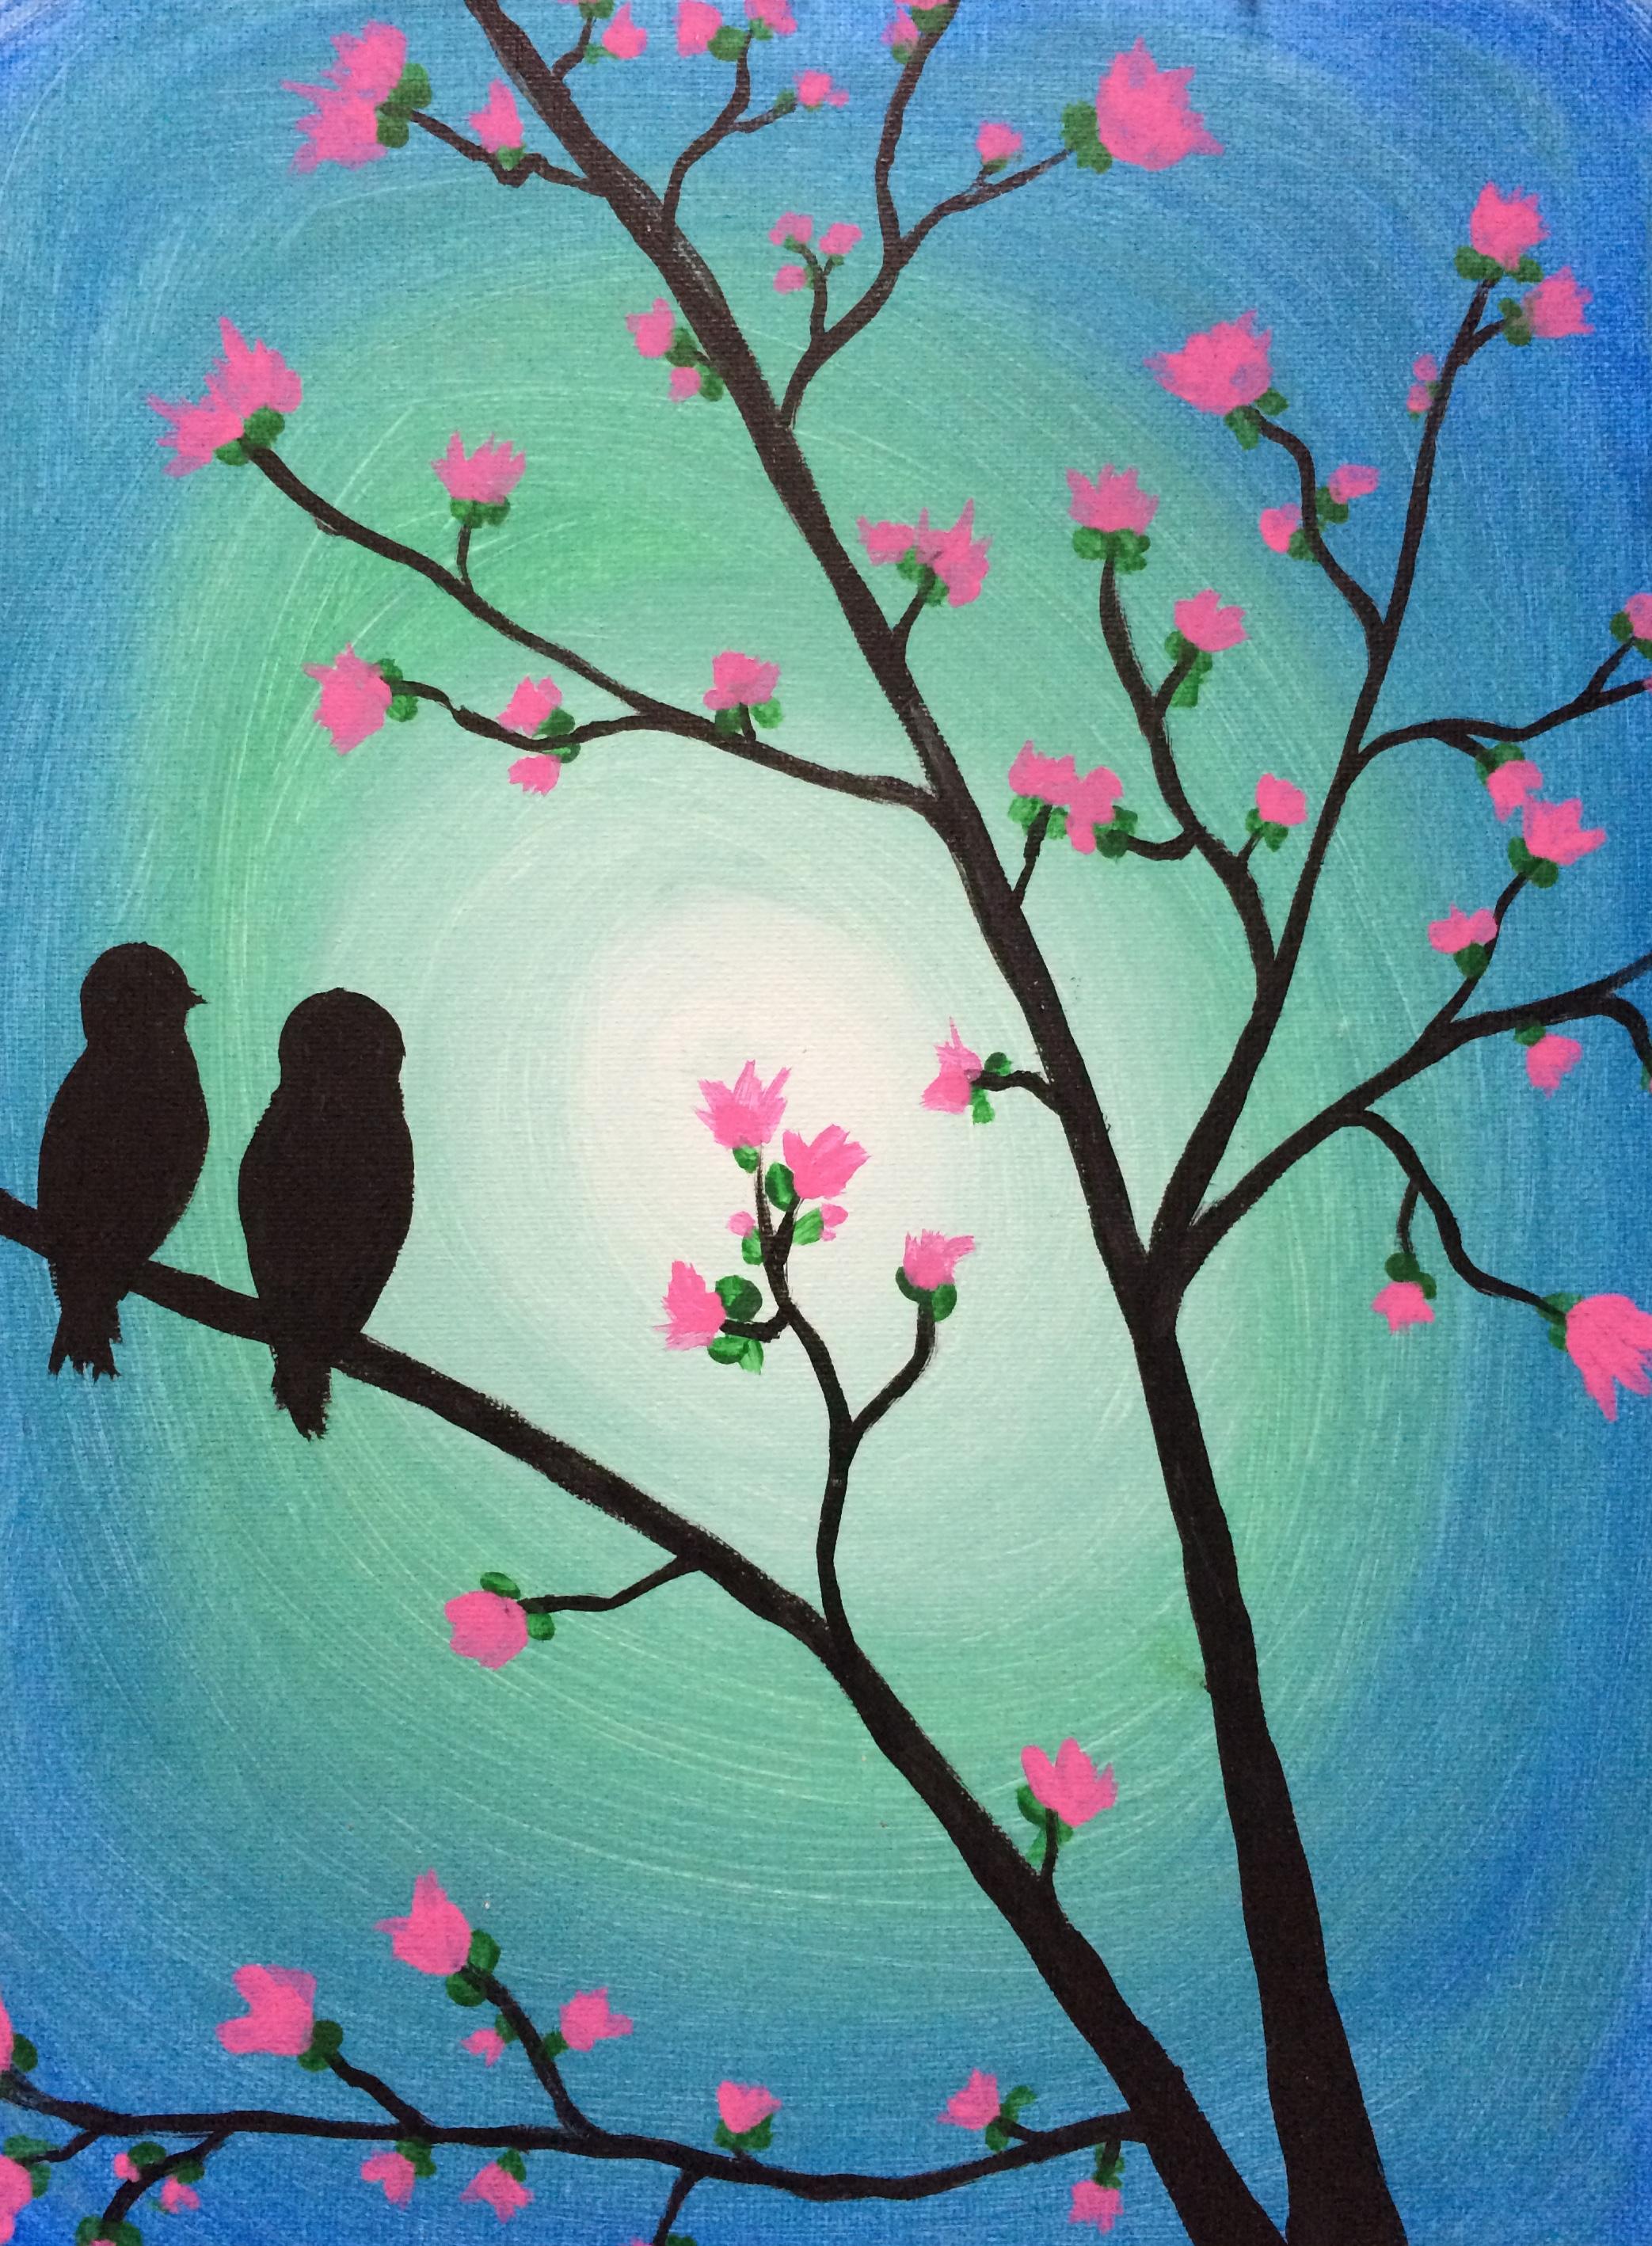 Bird Friends on Tree